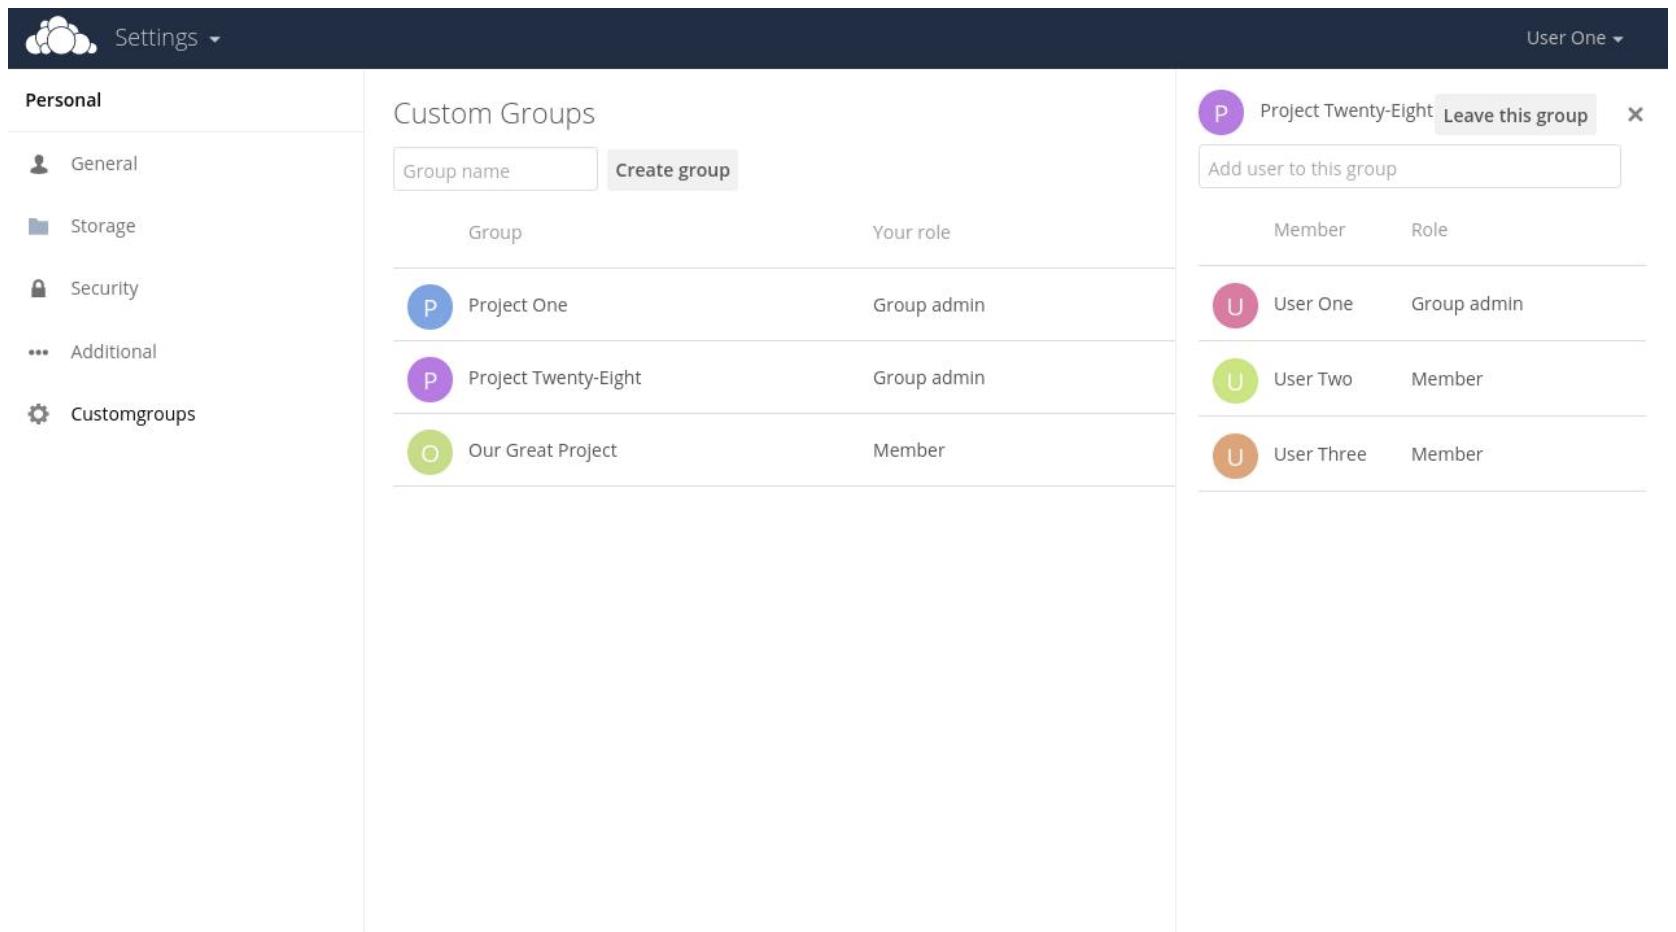 ownCloud Custom Groups